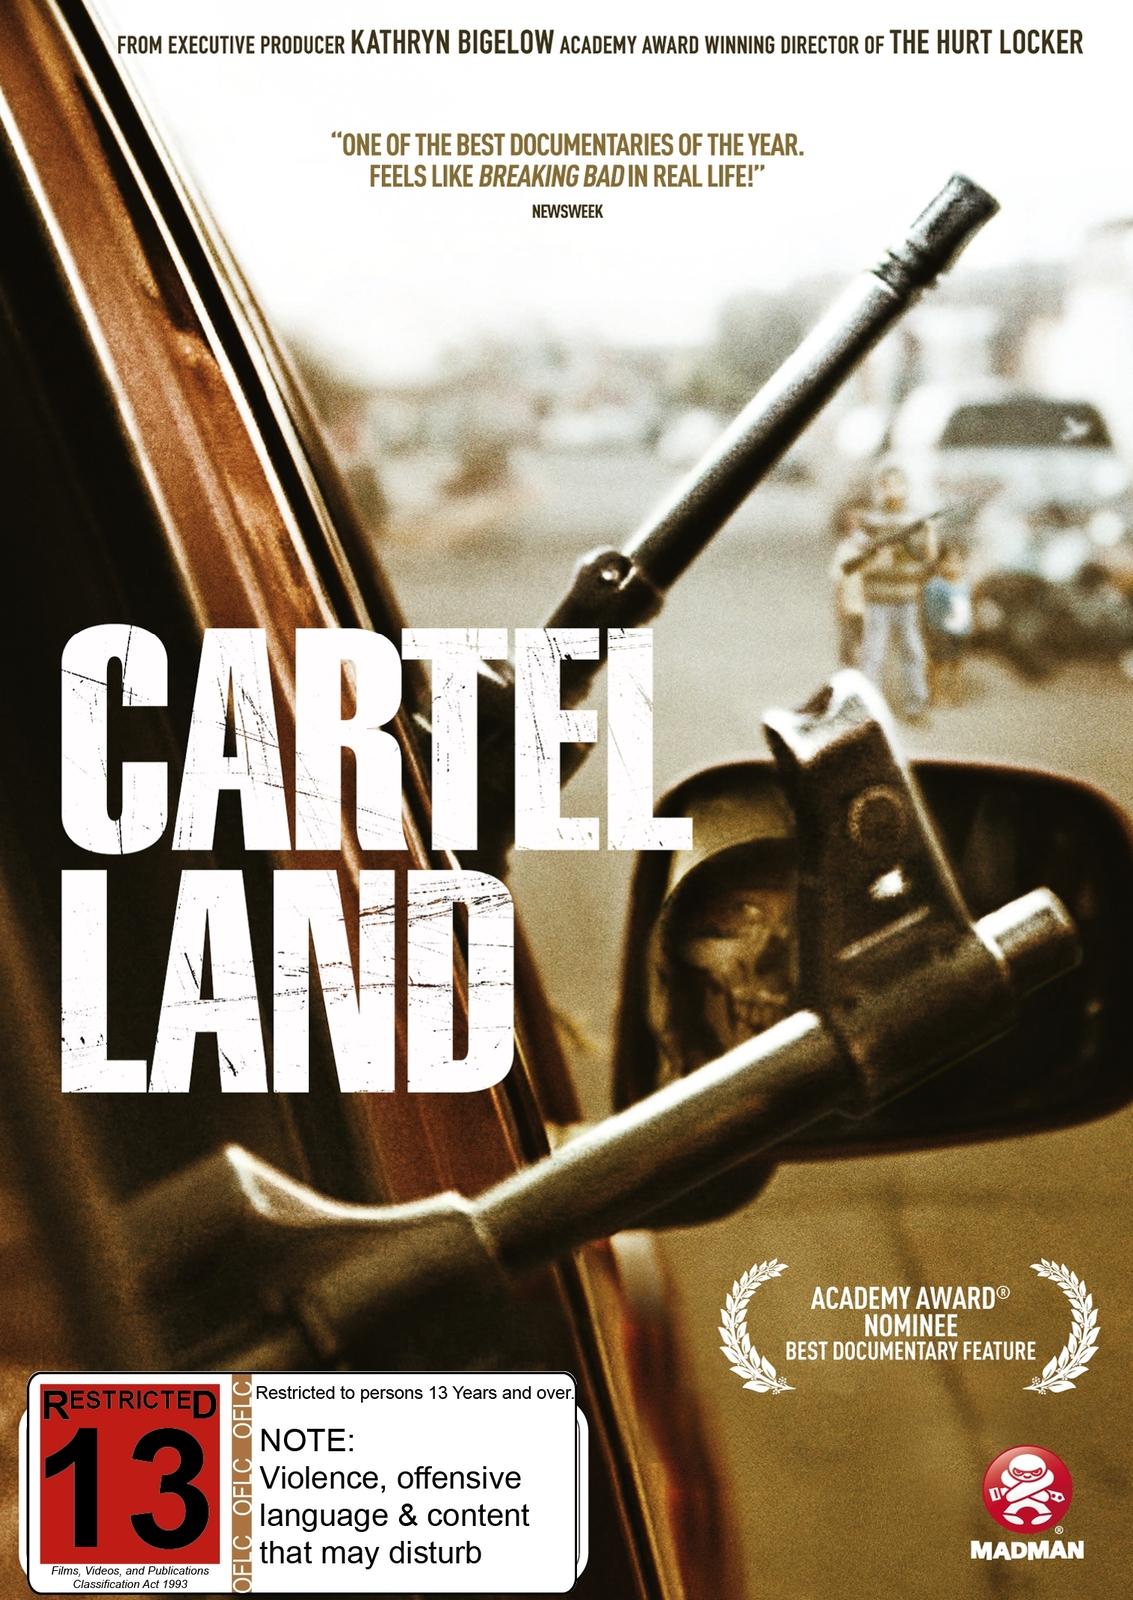 Cartel Land on DVD image